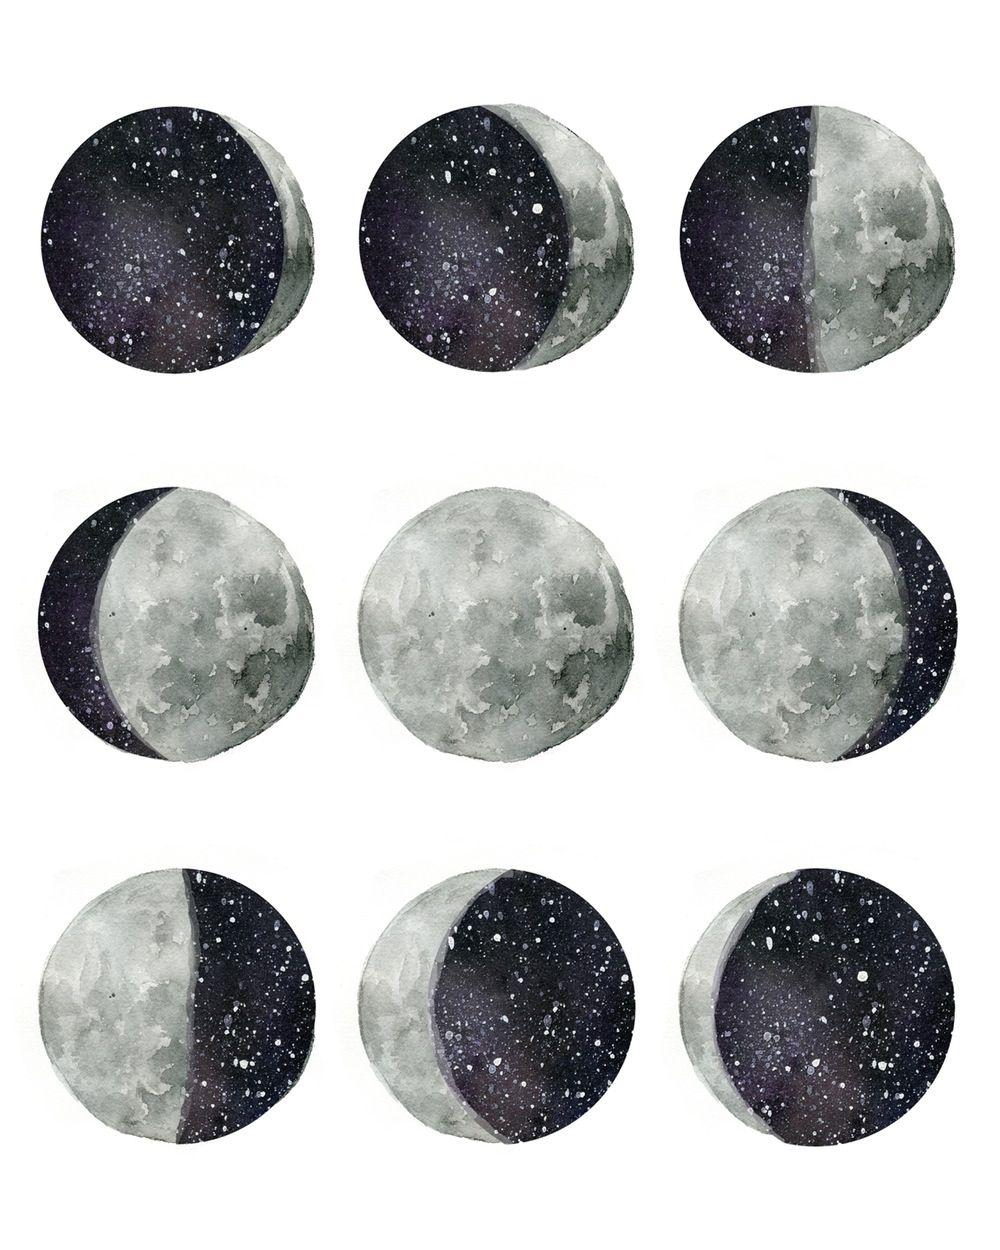 594 Words Essay on the Moon